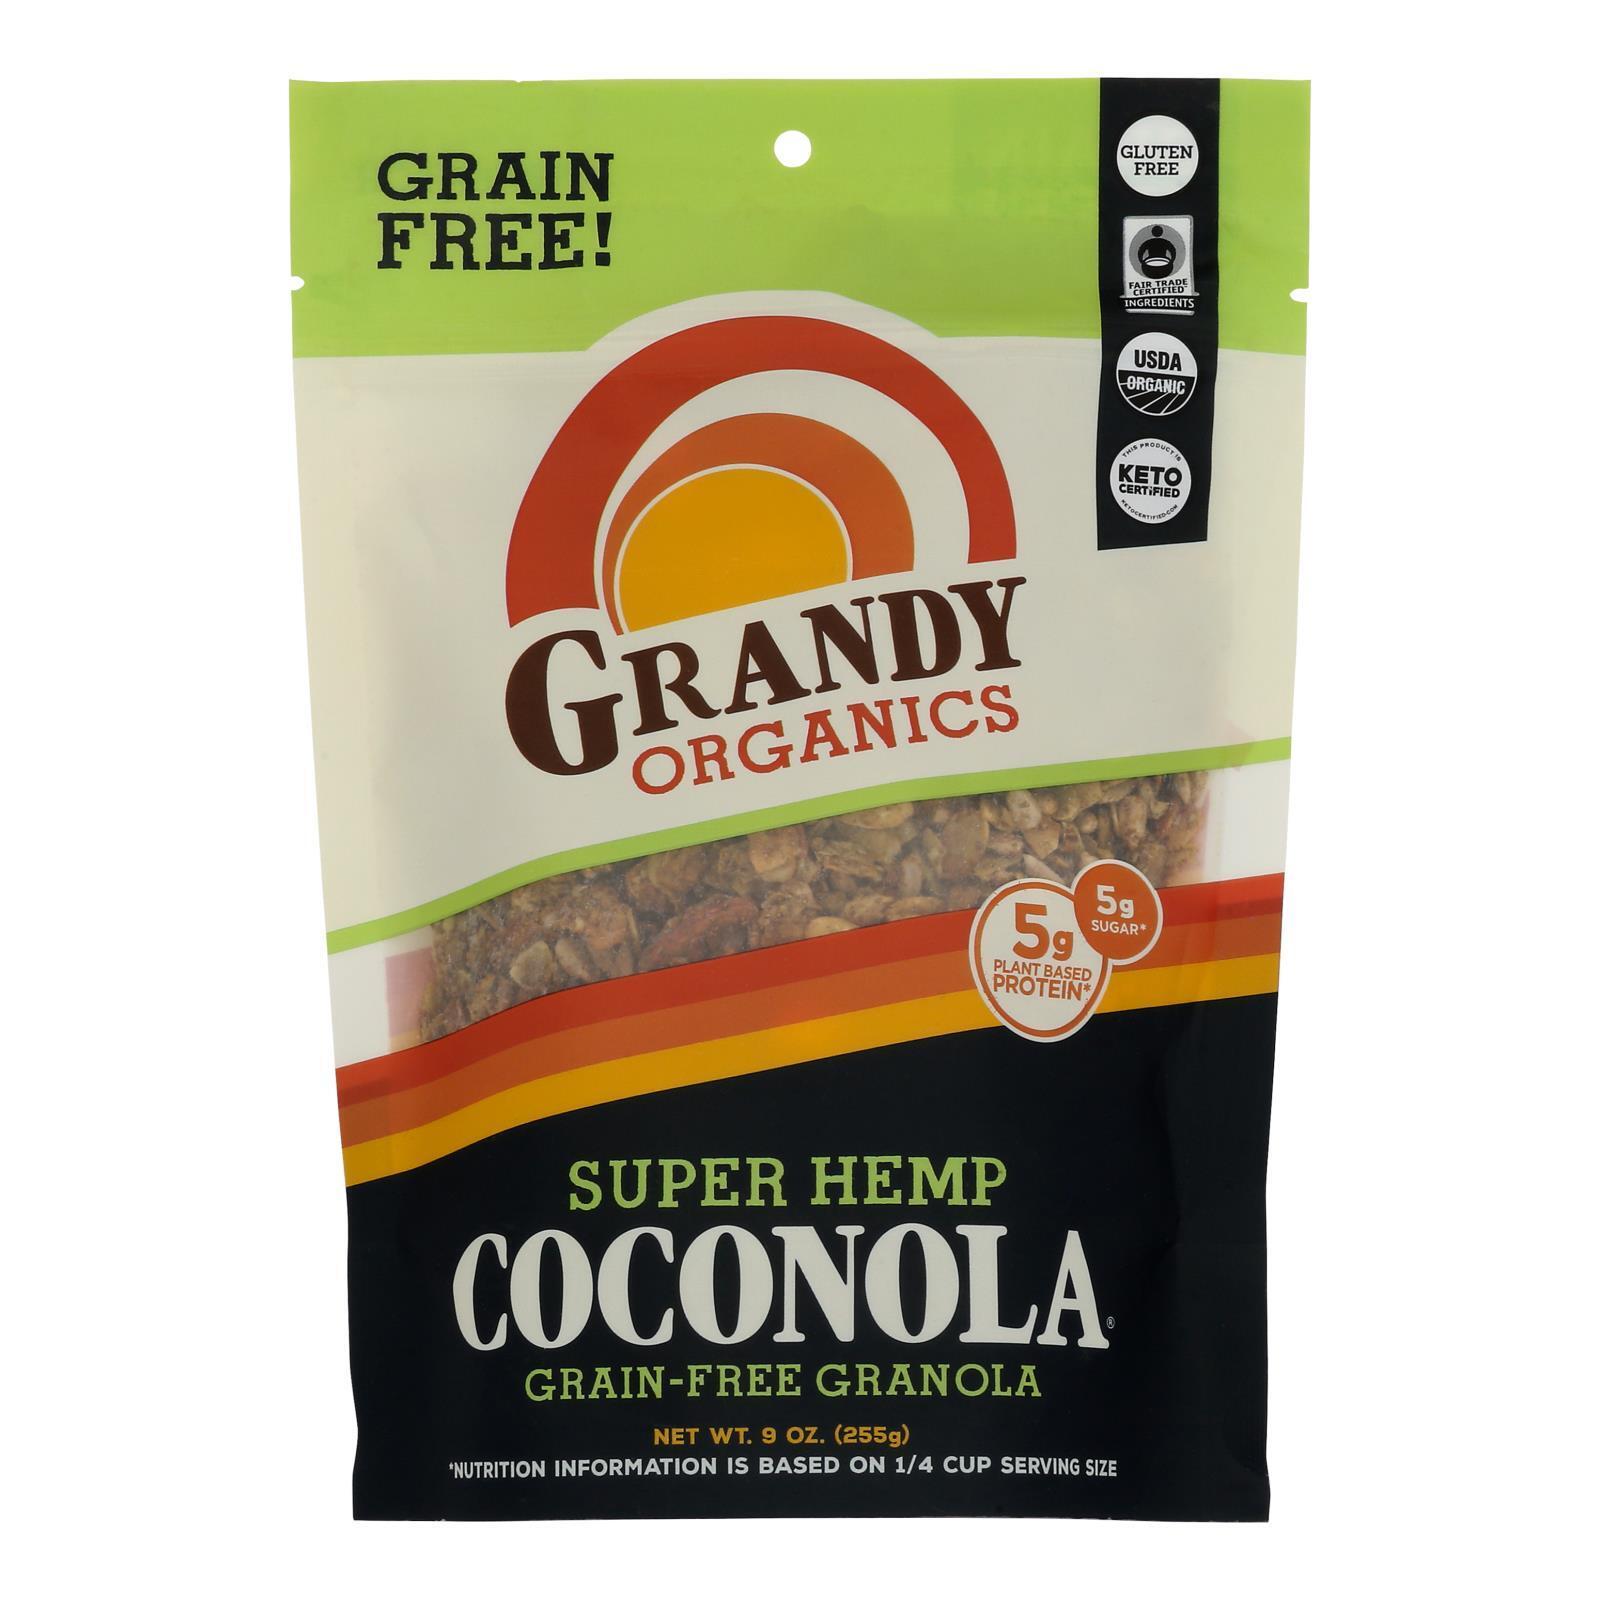 Grandy Oats Organic Granola - Super Hemp Blend Coconola - Case of 6 - 9 oz